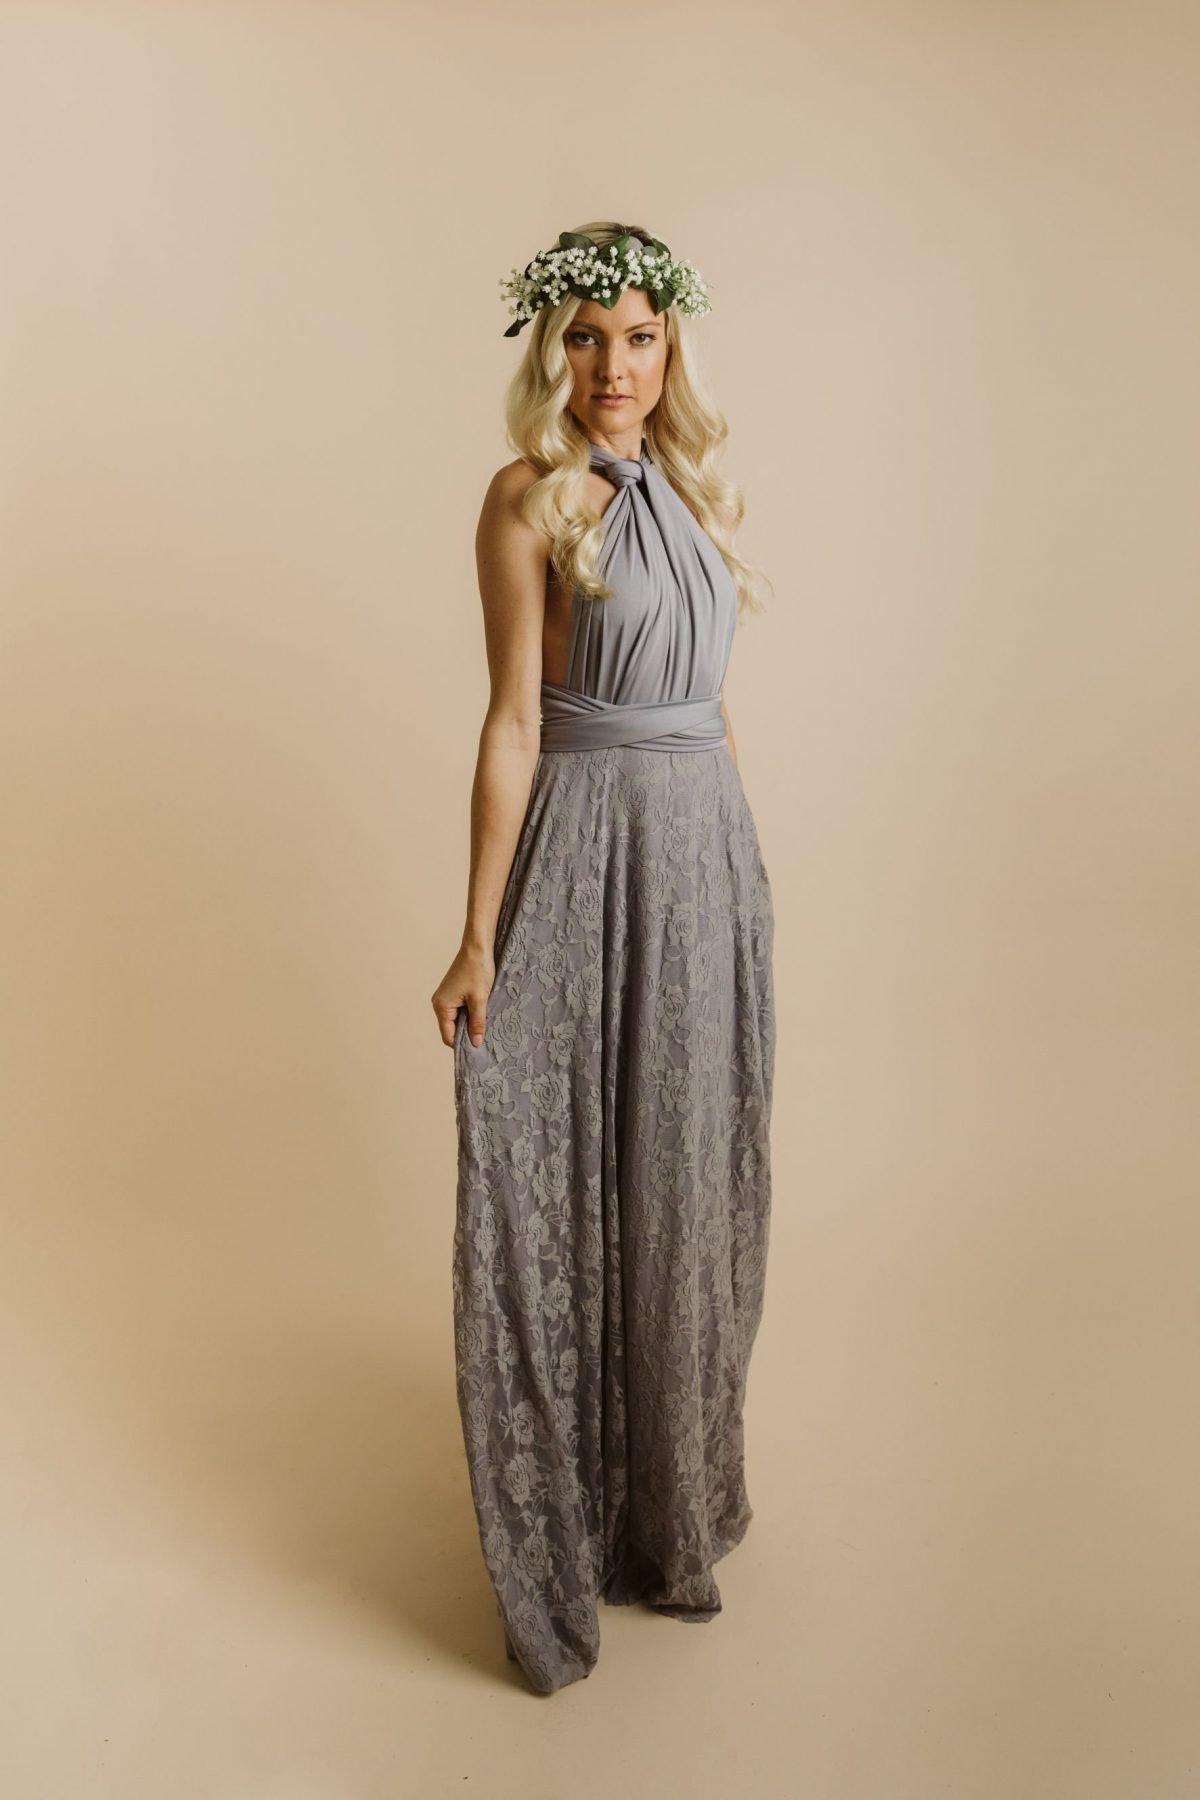 Lace Bridesmaid Dresses NZ